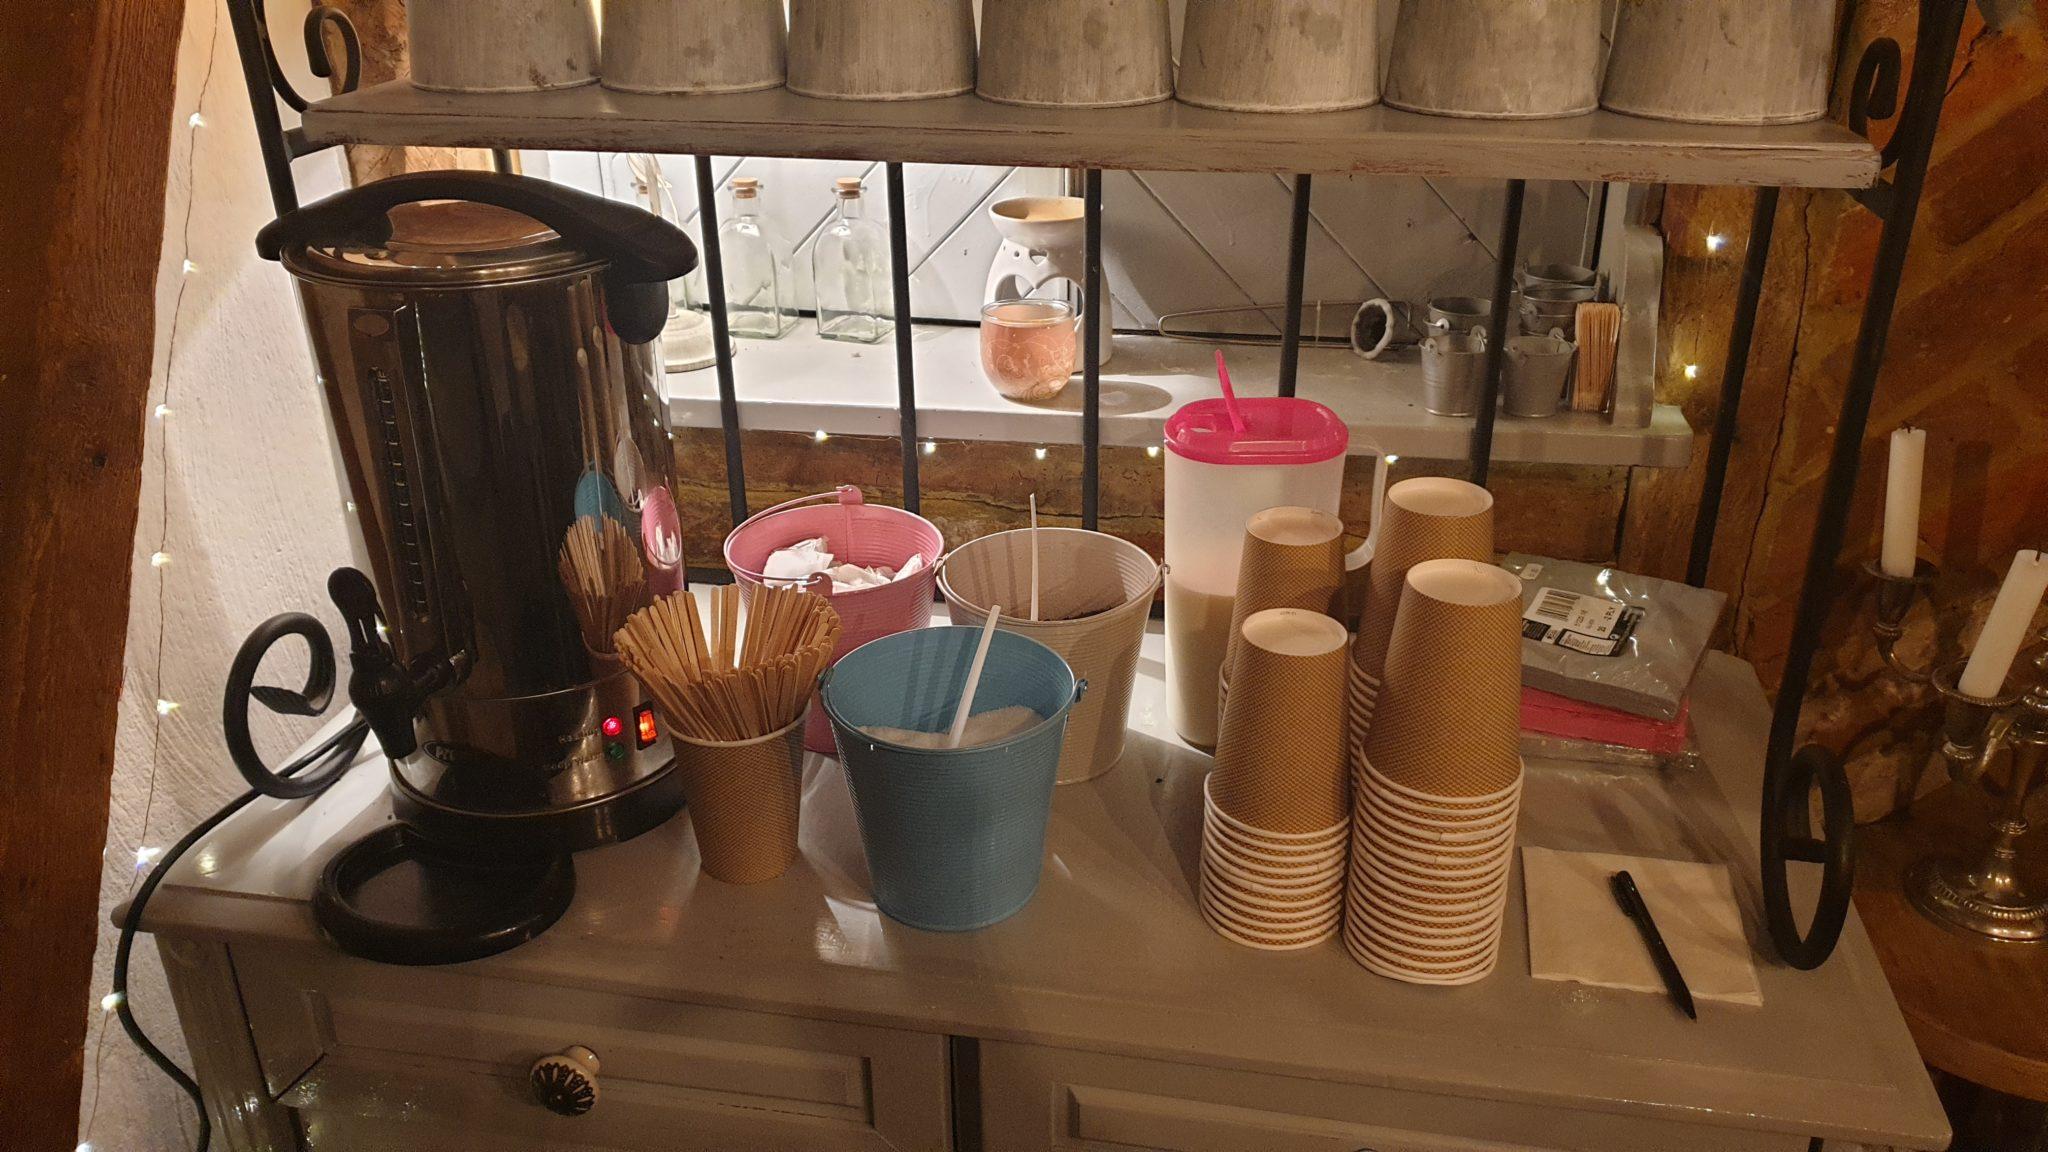 Tea & Coffee, 90th Birthday 15/2/2020